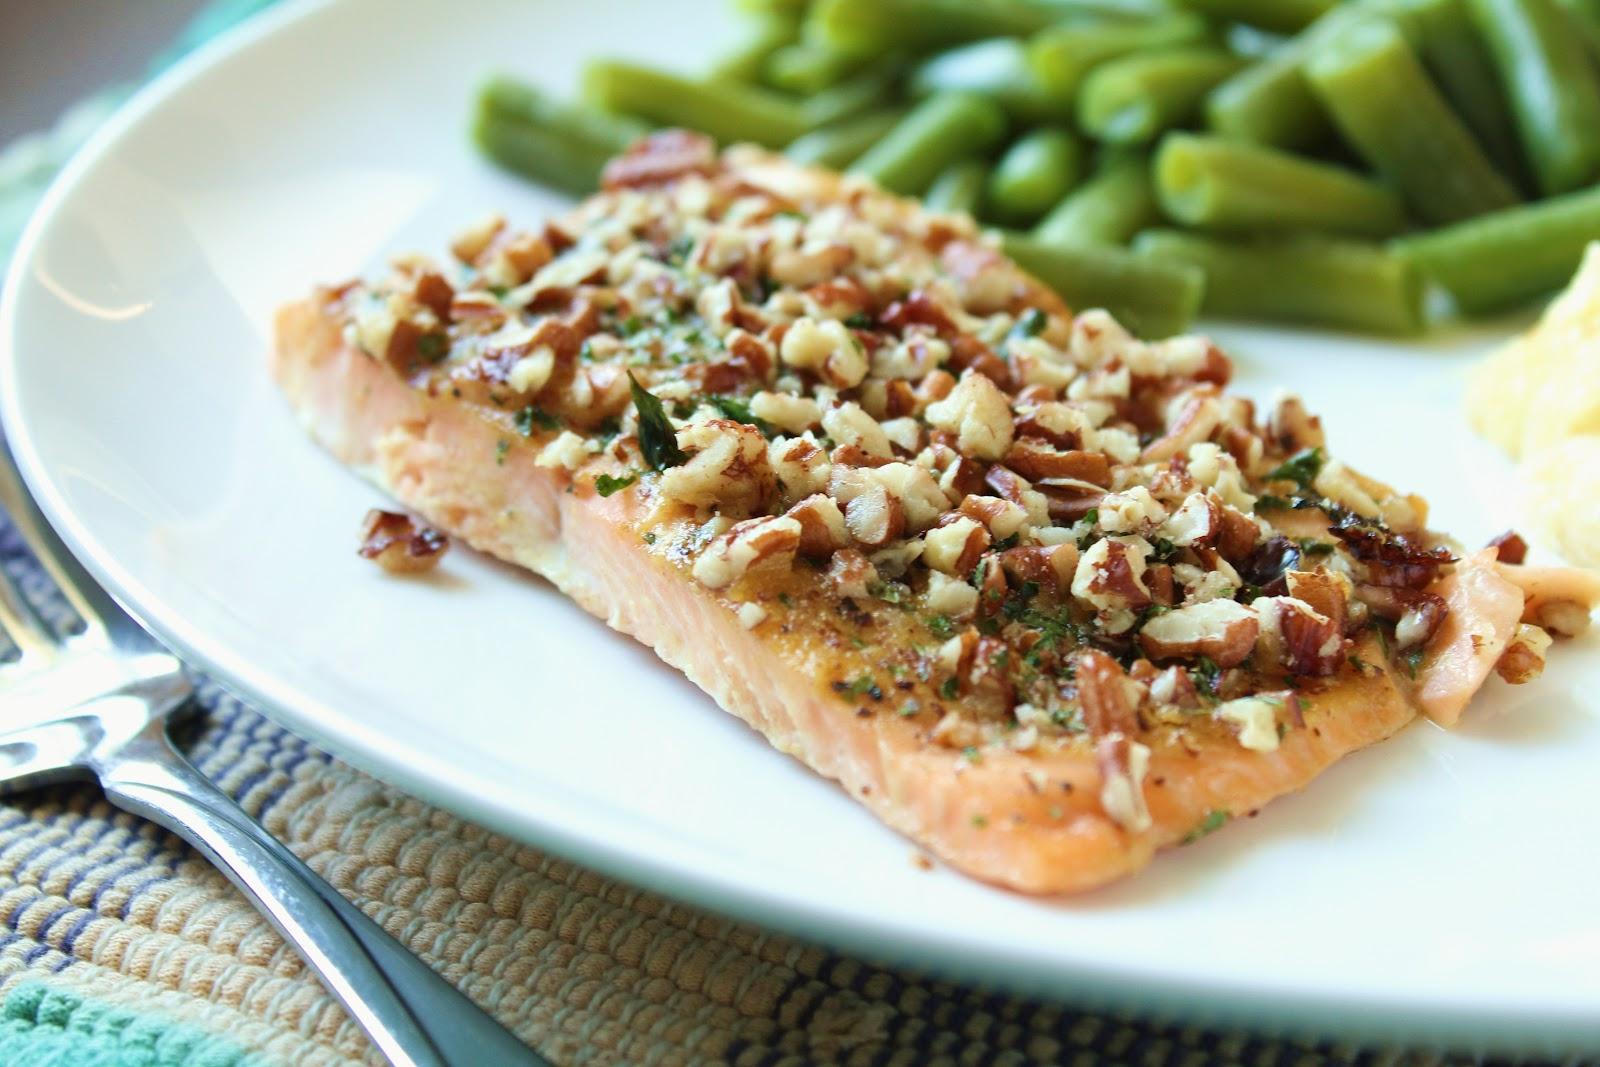 ... baked dijon salmon recipe yummly baked dijon salmon baked dijon salmon